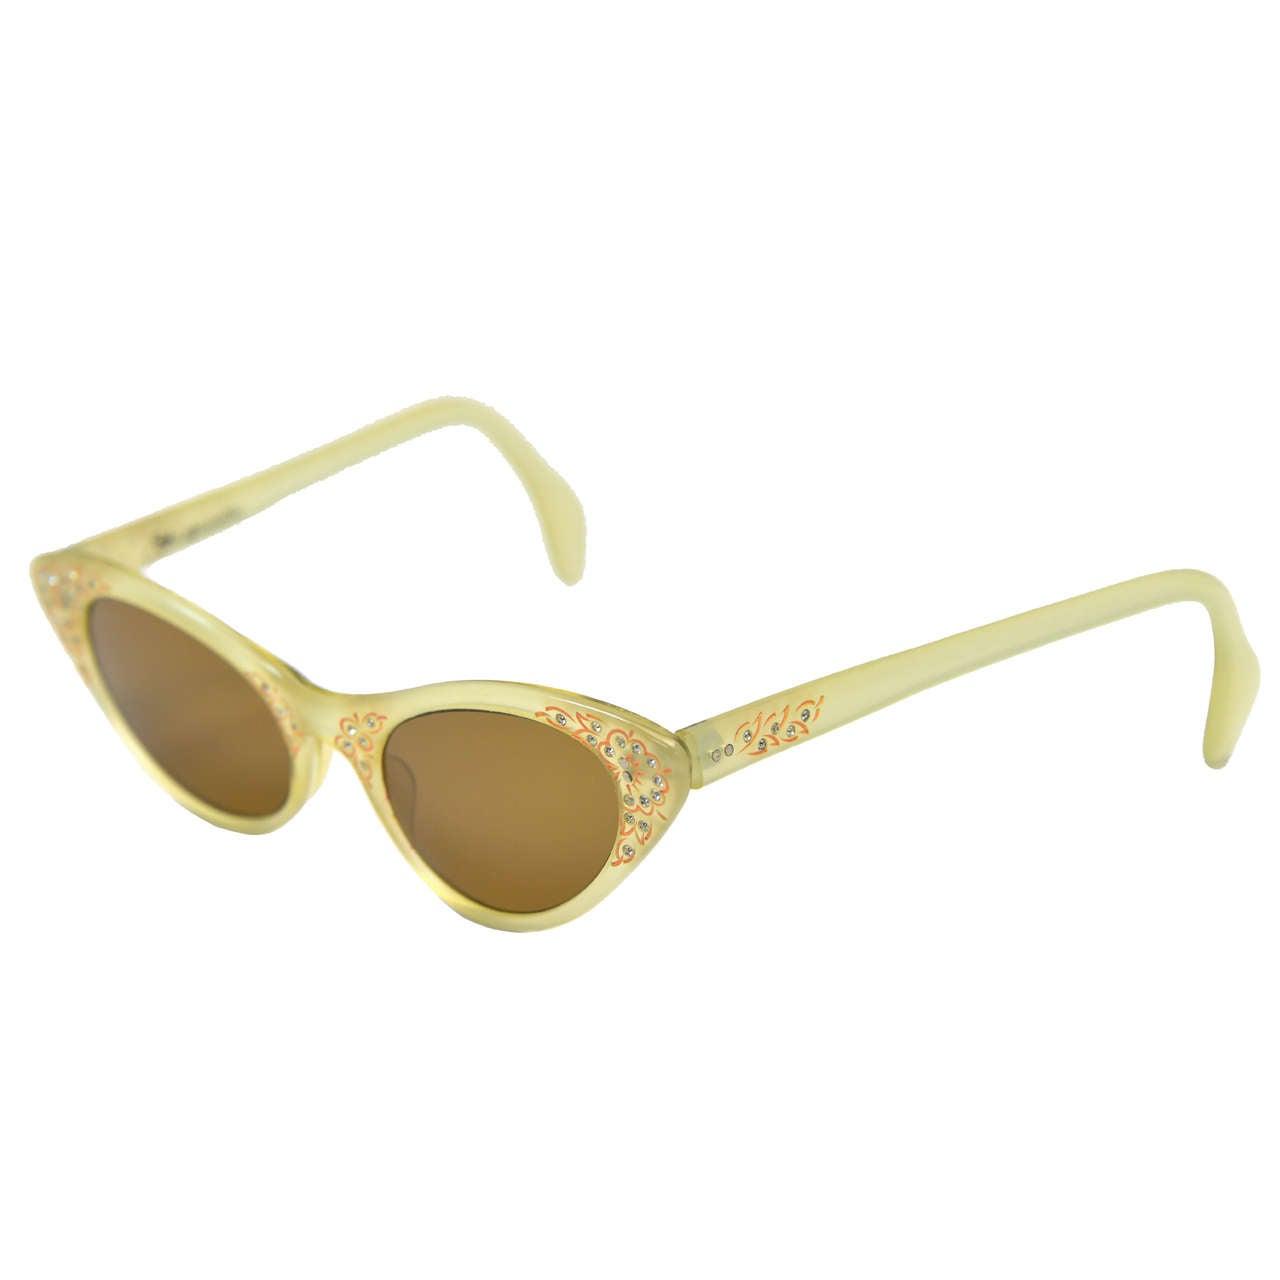 1950s Schiaparelli Sunglasses